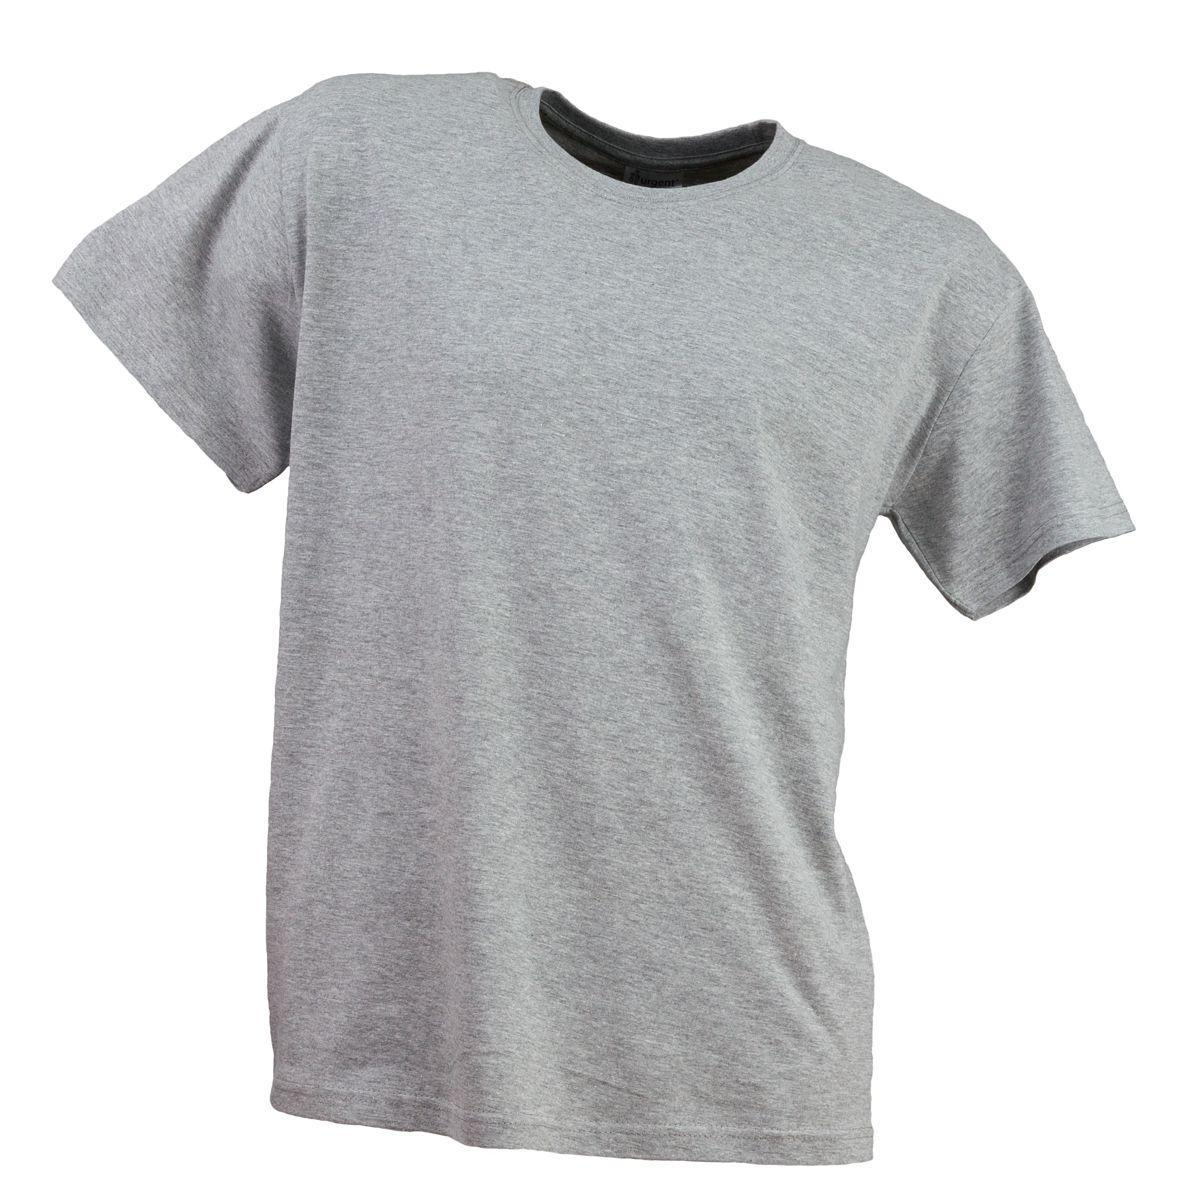 Футболка T-SHIRT MĘSKI POMARAŃCZ 180g плотностью 180g, серого цвета.  Urgent (POLAND) S